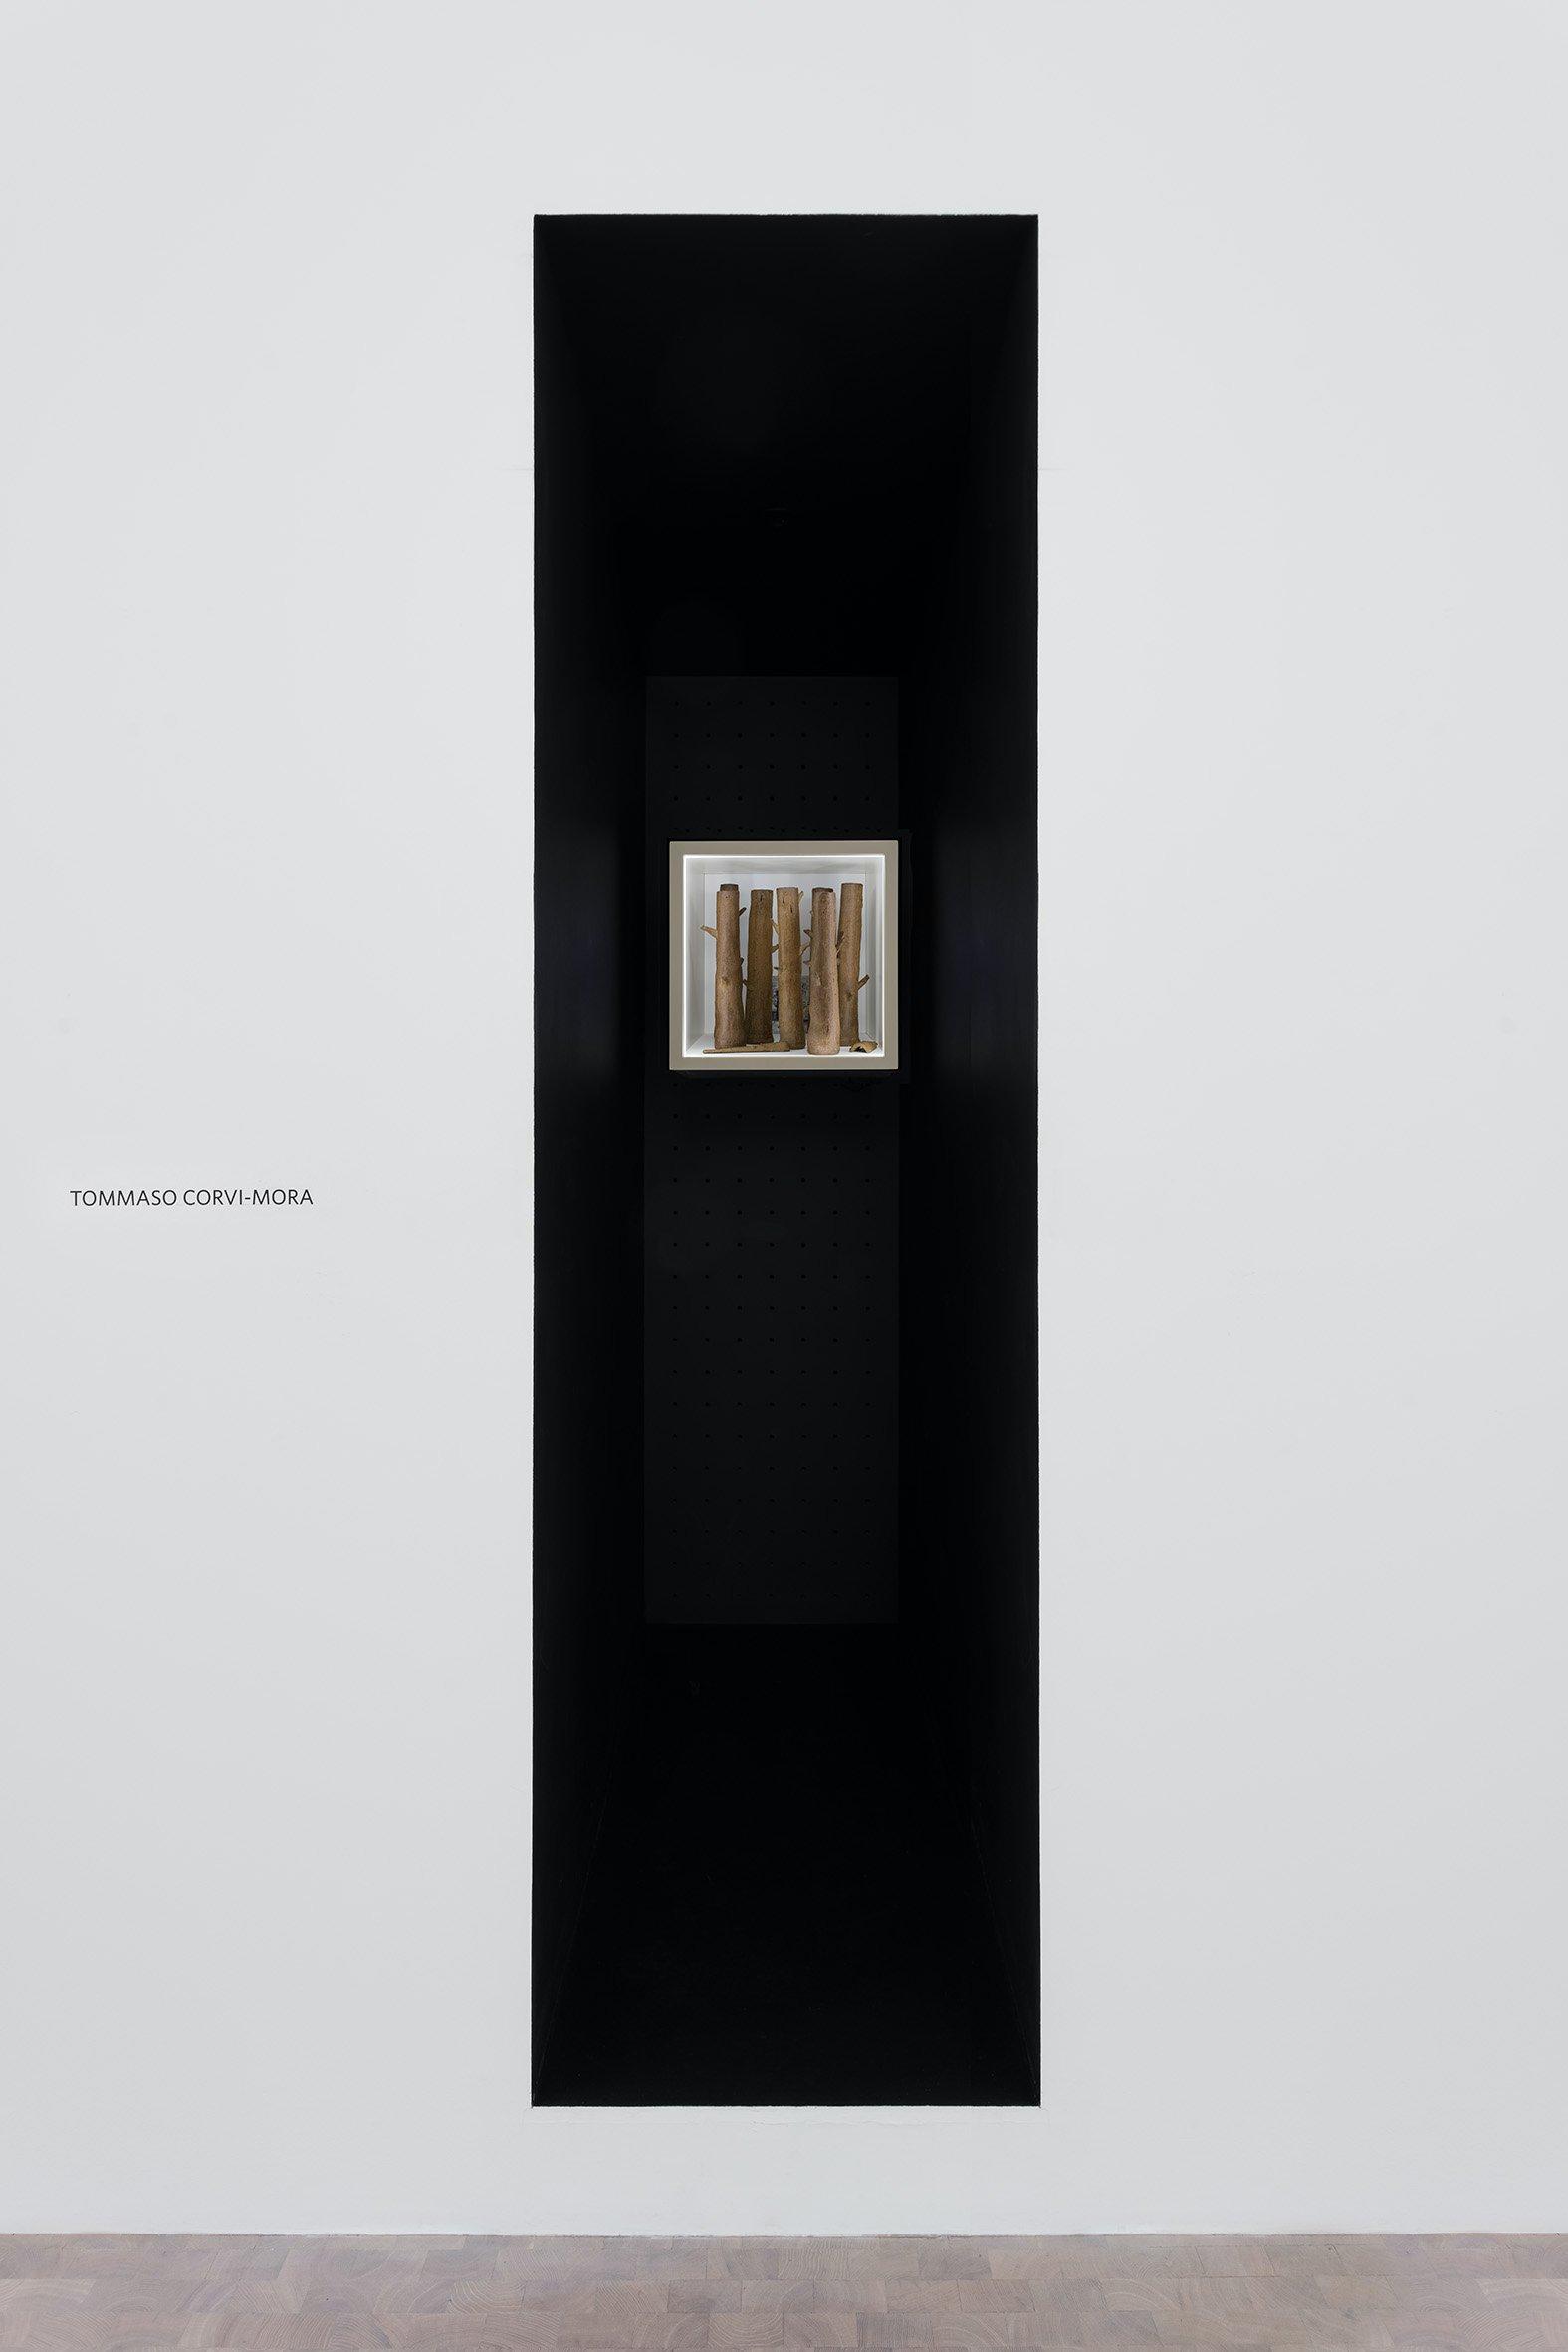 Pippy Houldsworth Gallery Tommaso Corvi-Mora 1